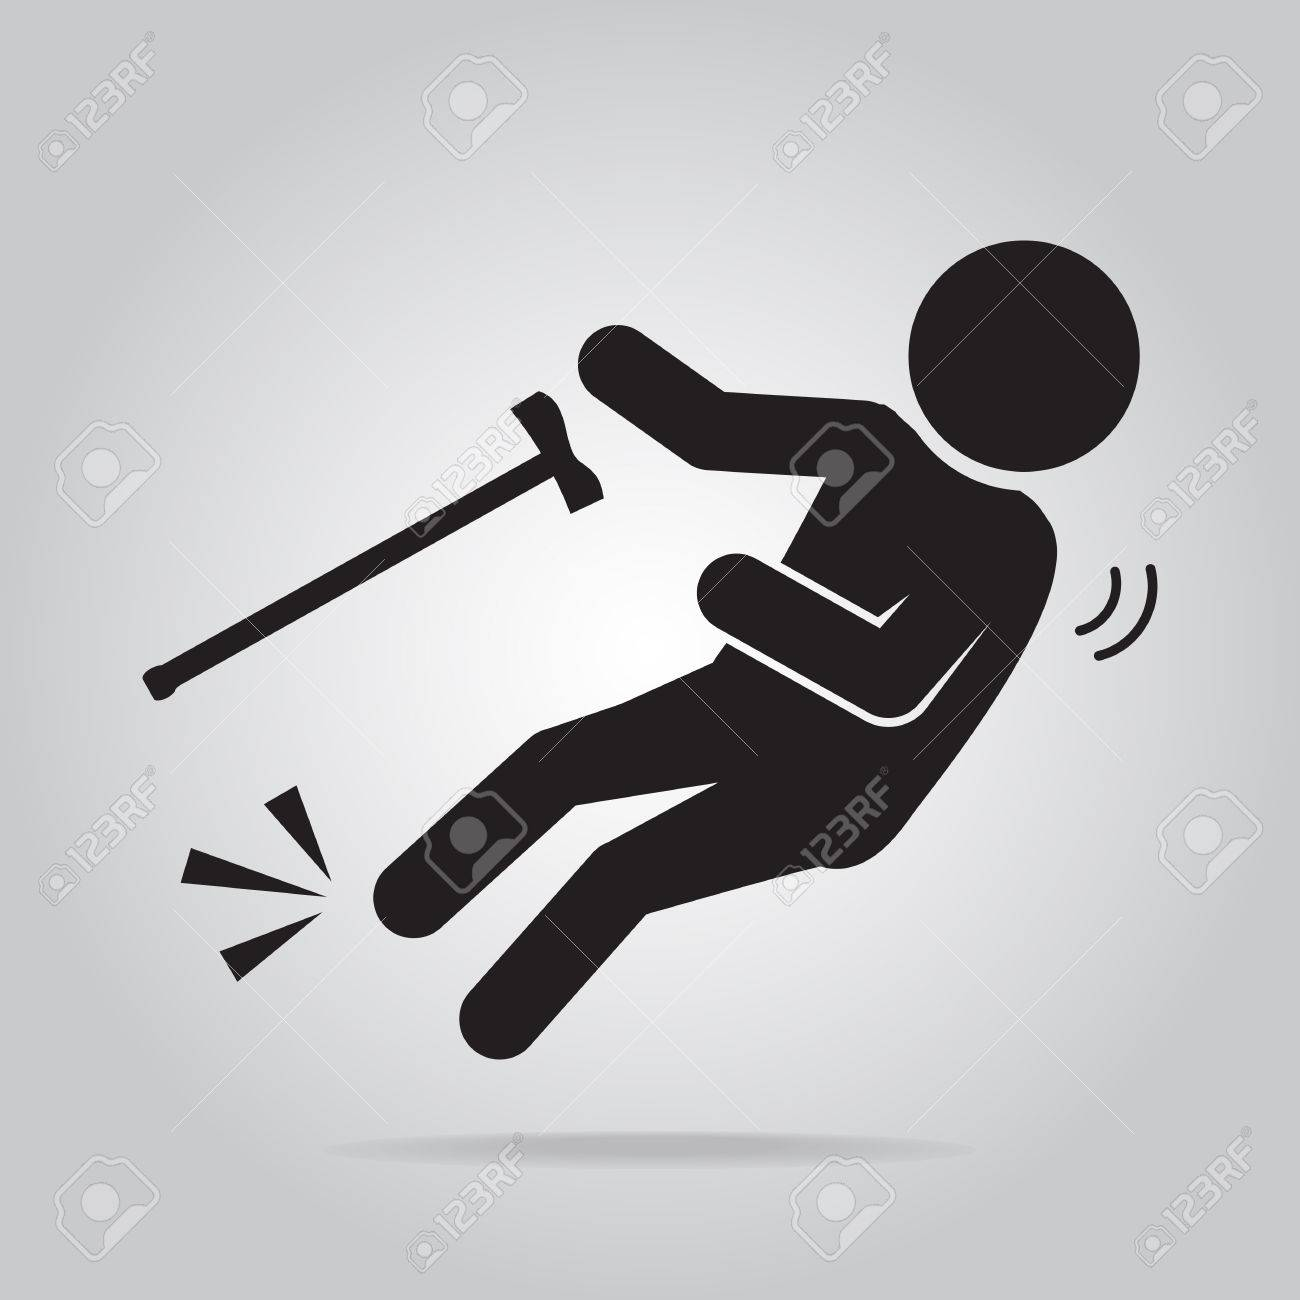 Elderly with stick and slip injury, person injury symbol illustration - 63801024